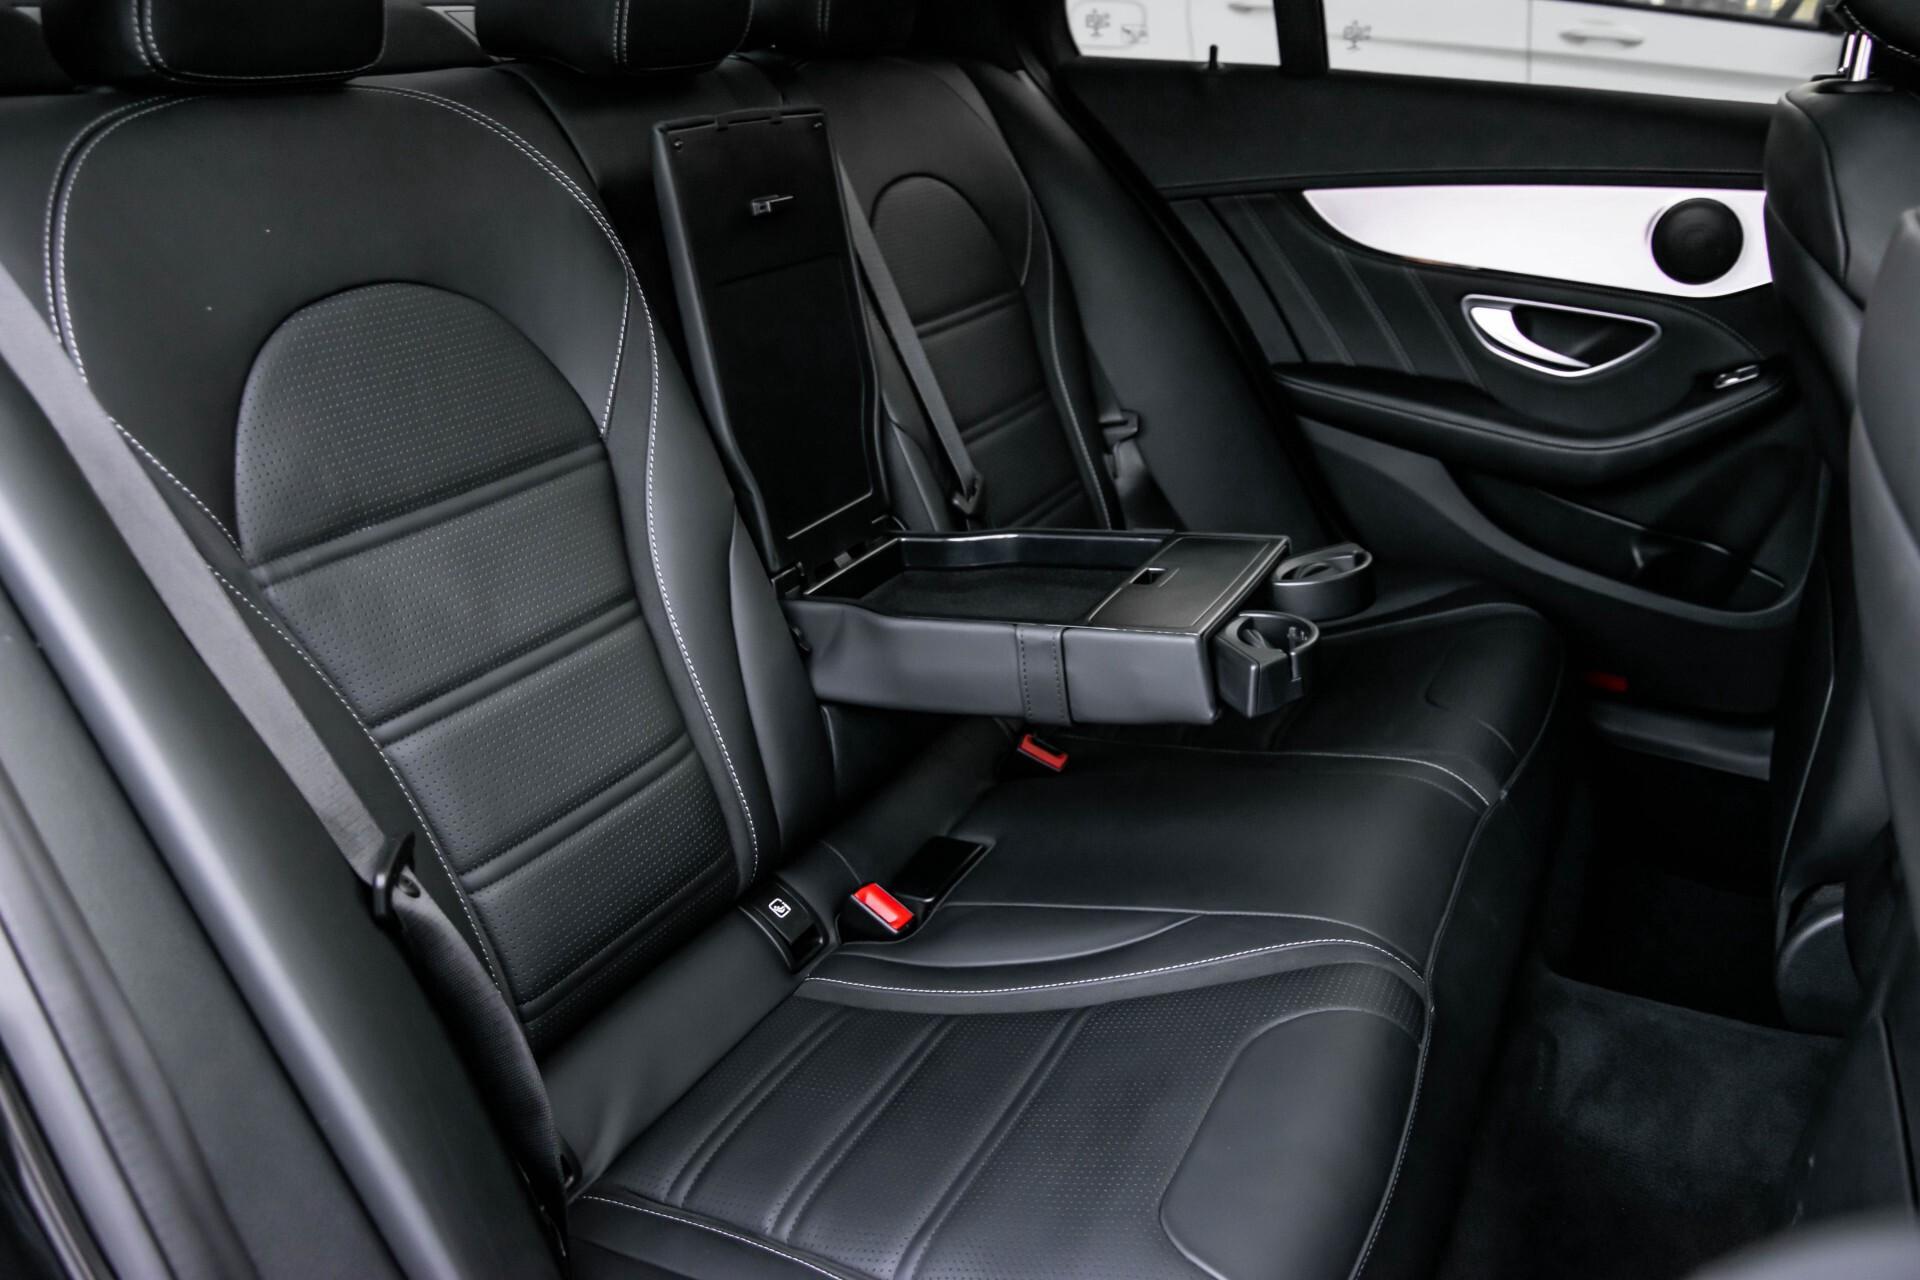 Mercedes-Benz C-Klasse 63 AMG S Panorama/Distronic/Keyless/Comand/Camera/ILS Aut7 Foto 5